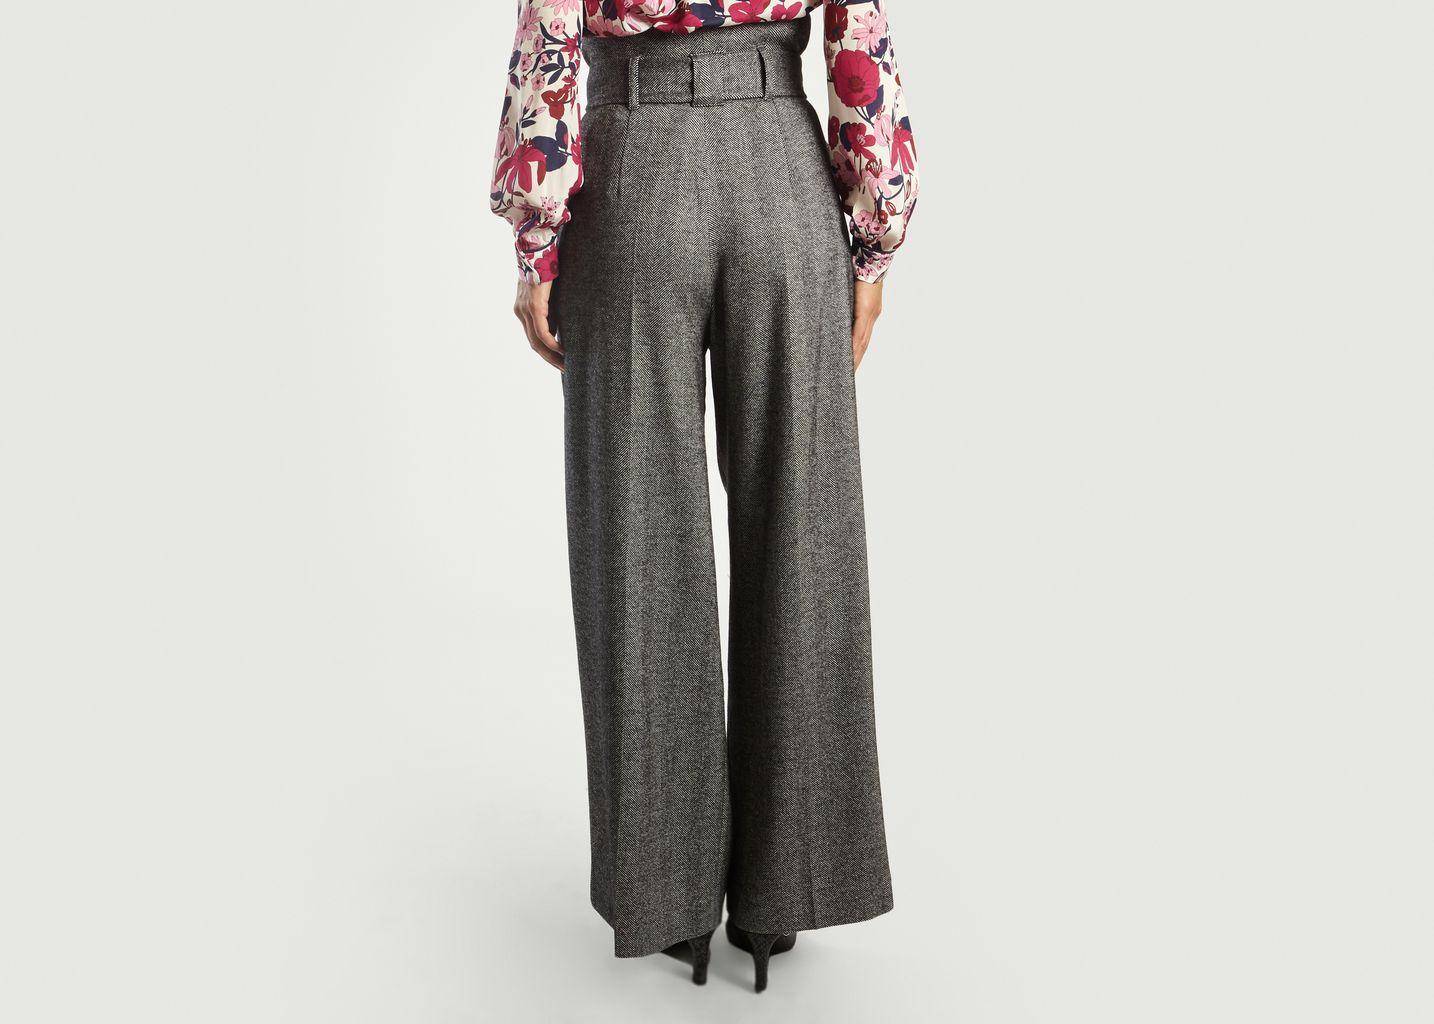 Chevron Large Trousers - Tara Jarmon